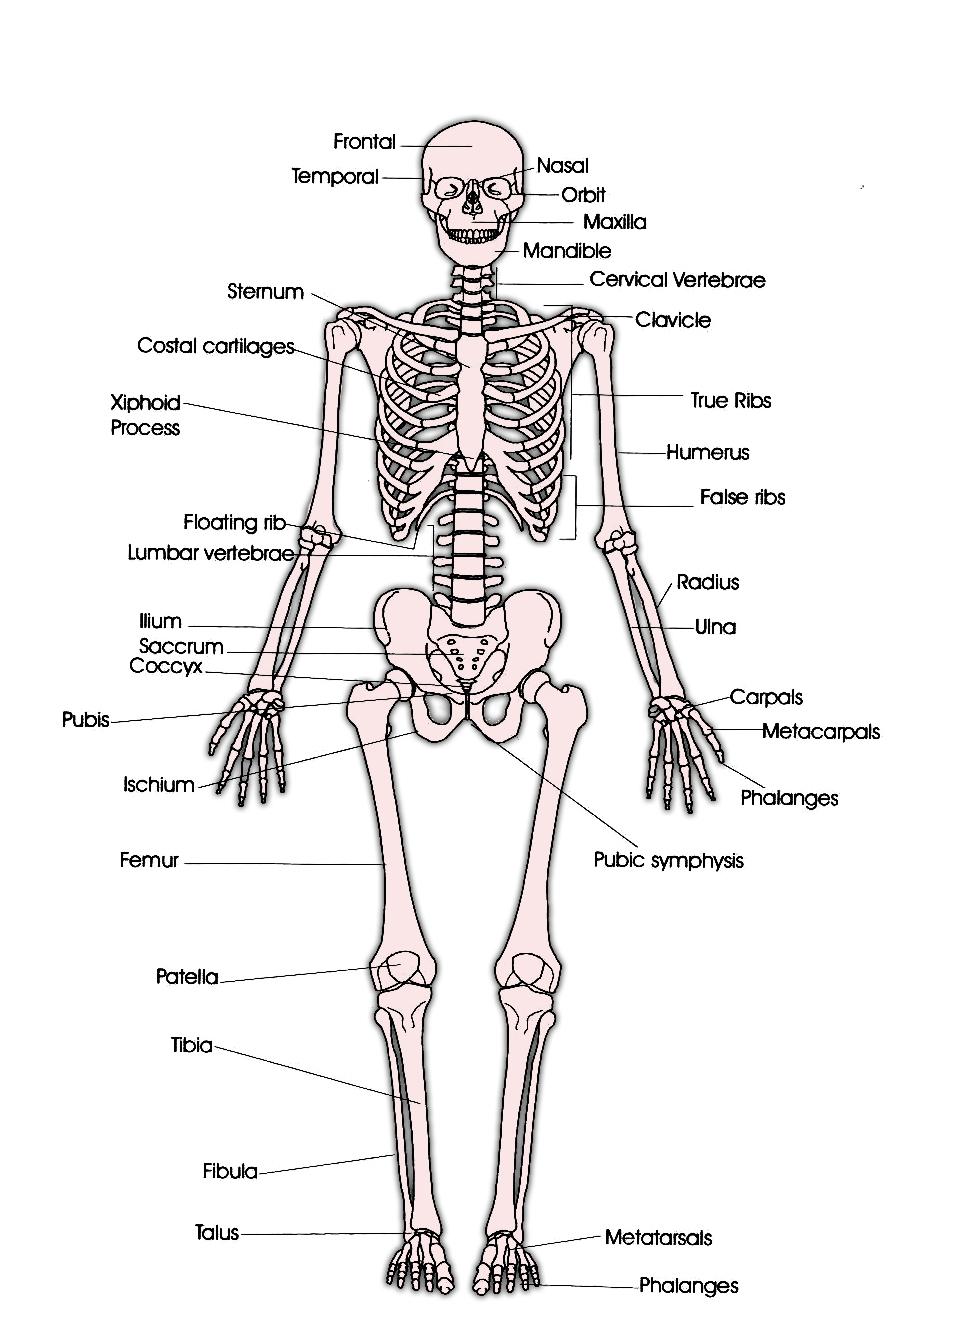 gambar tulang penyusun rangka tubuh